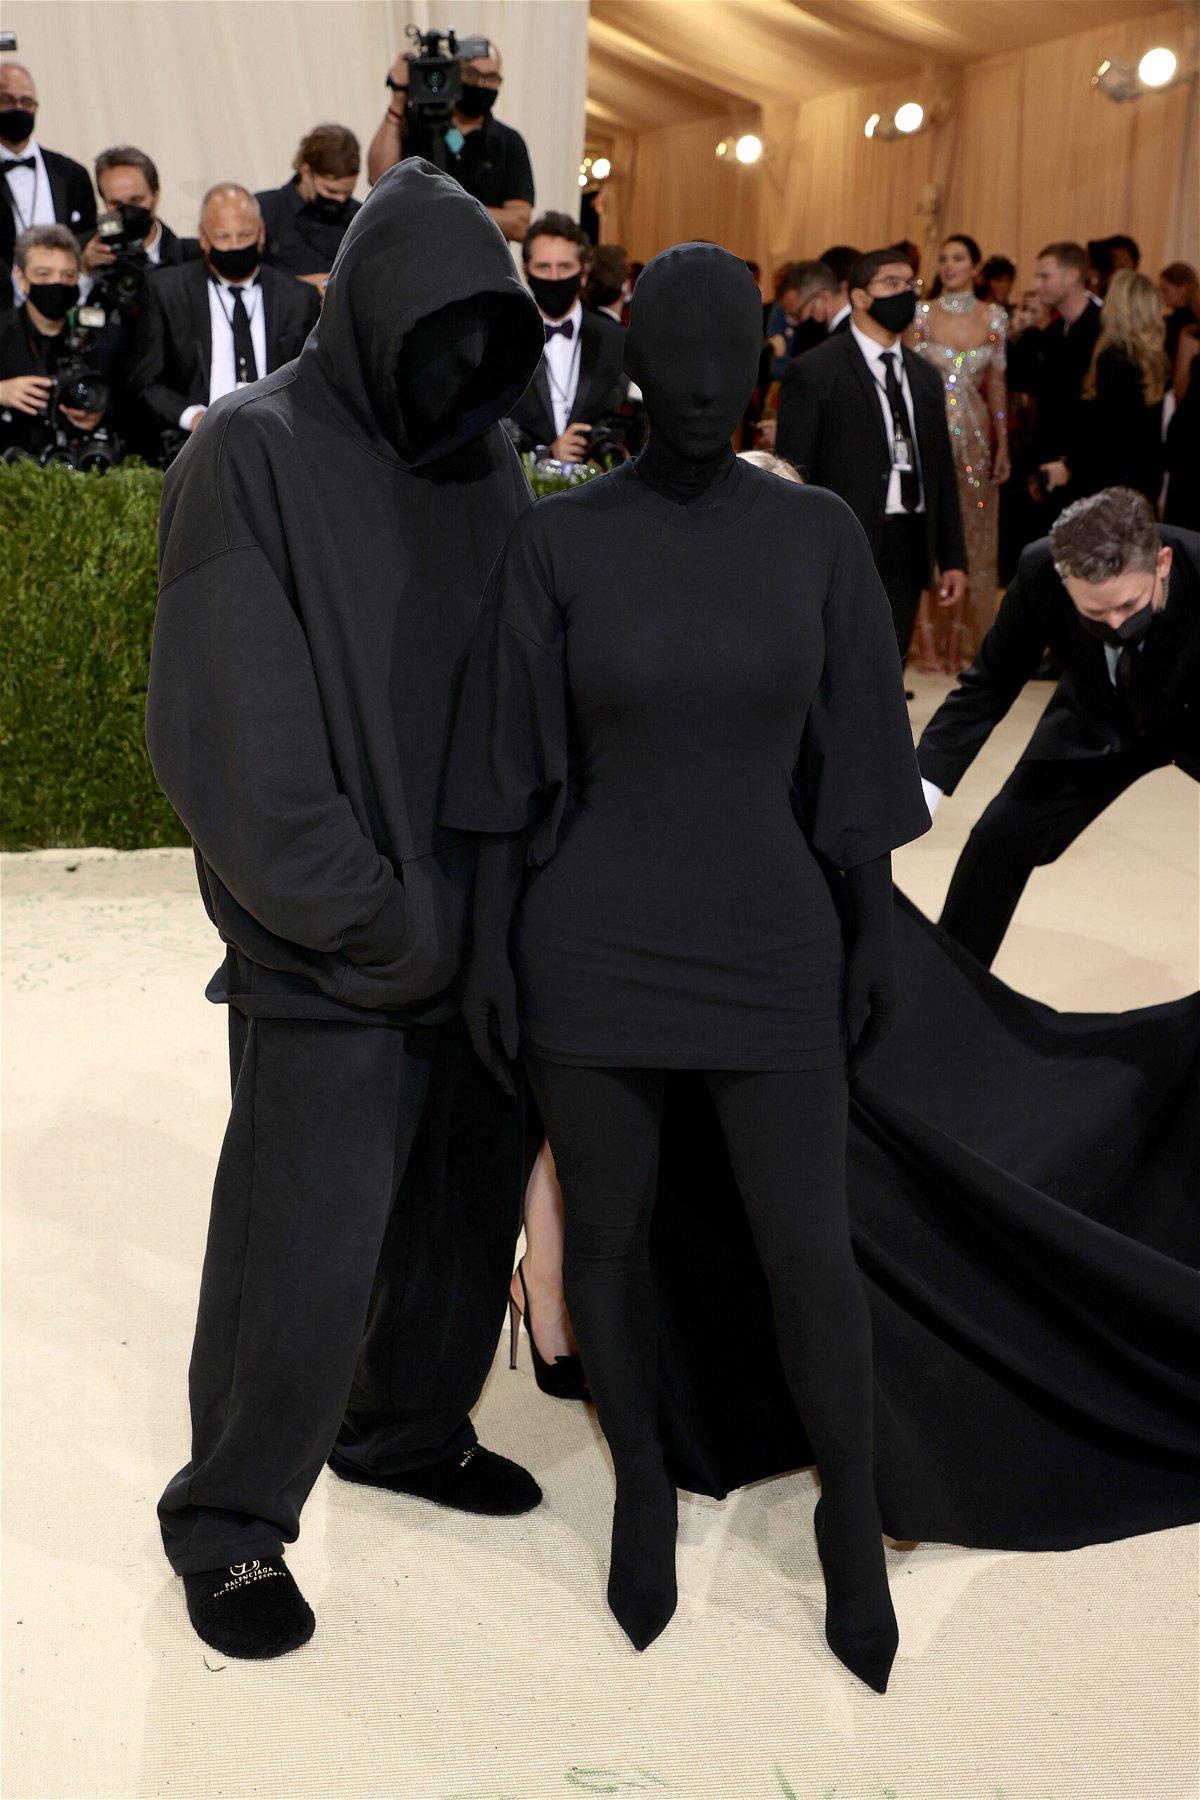 <i>Dimitrios Kambouris/Getty Images</i><br/>Demna Gvasalia and Kim Kardashian West at the 2021 Met Gala on September 13